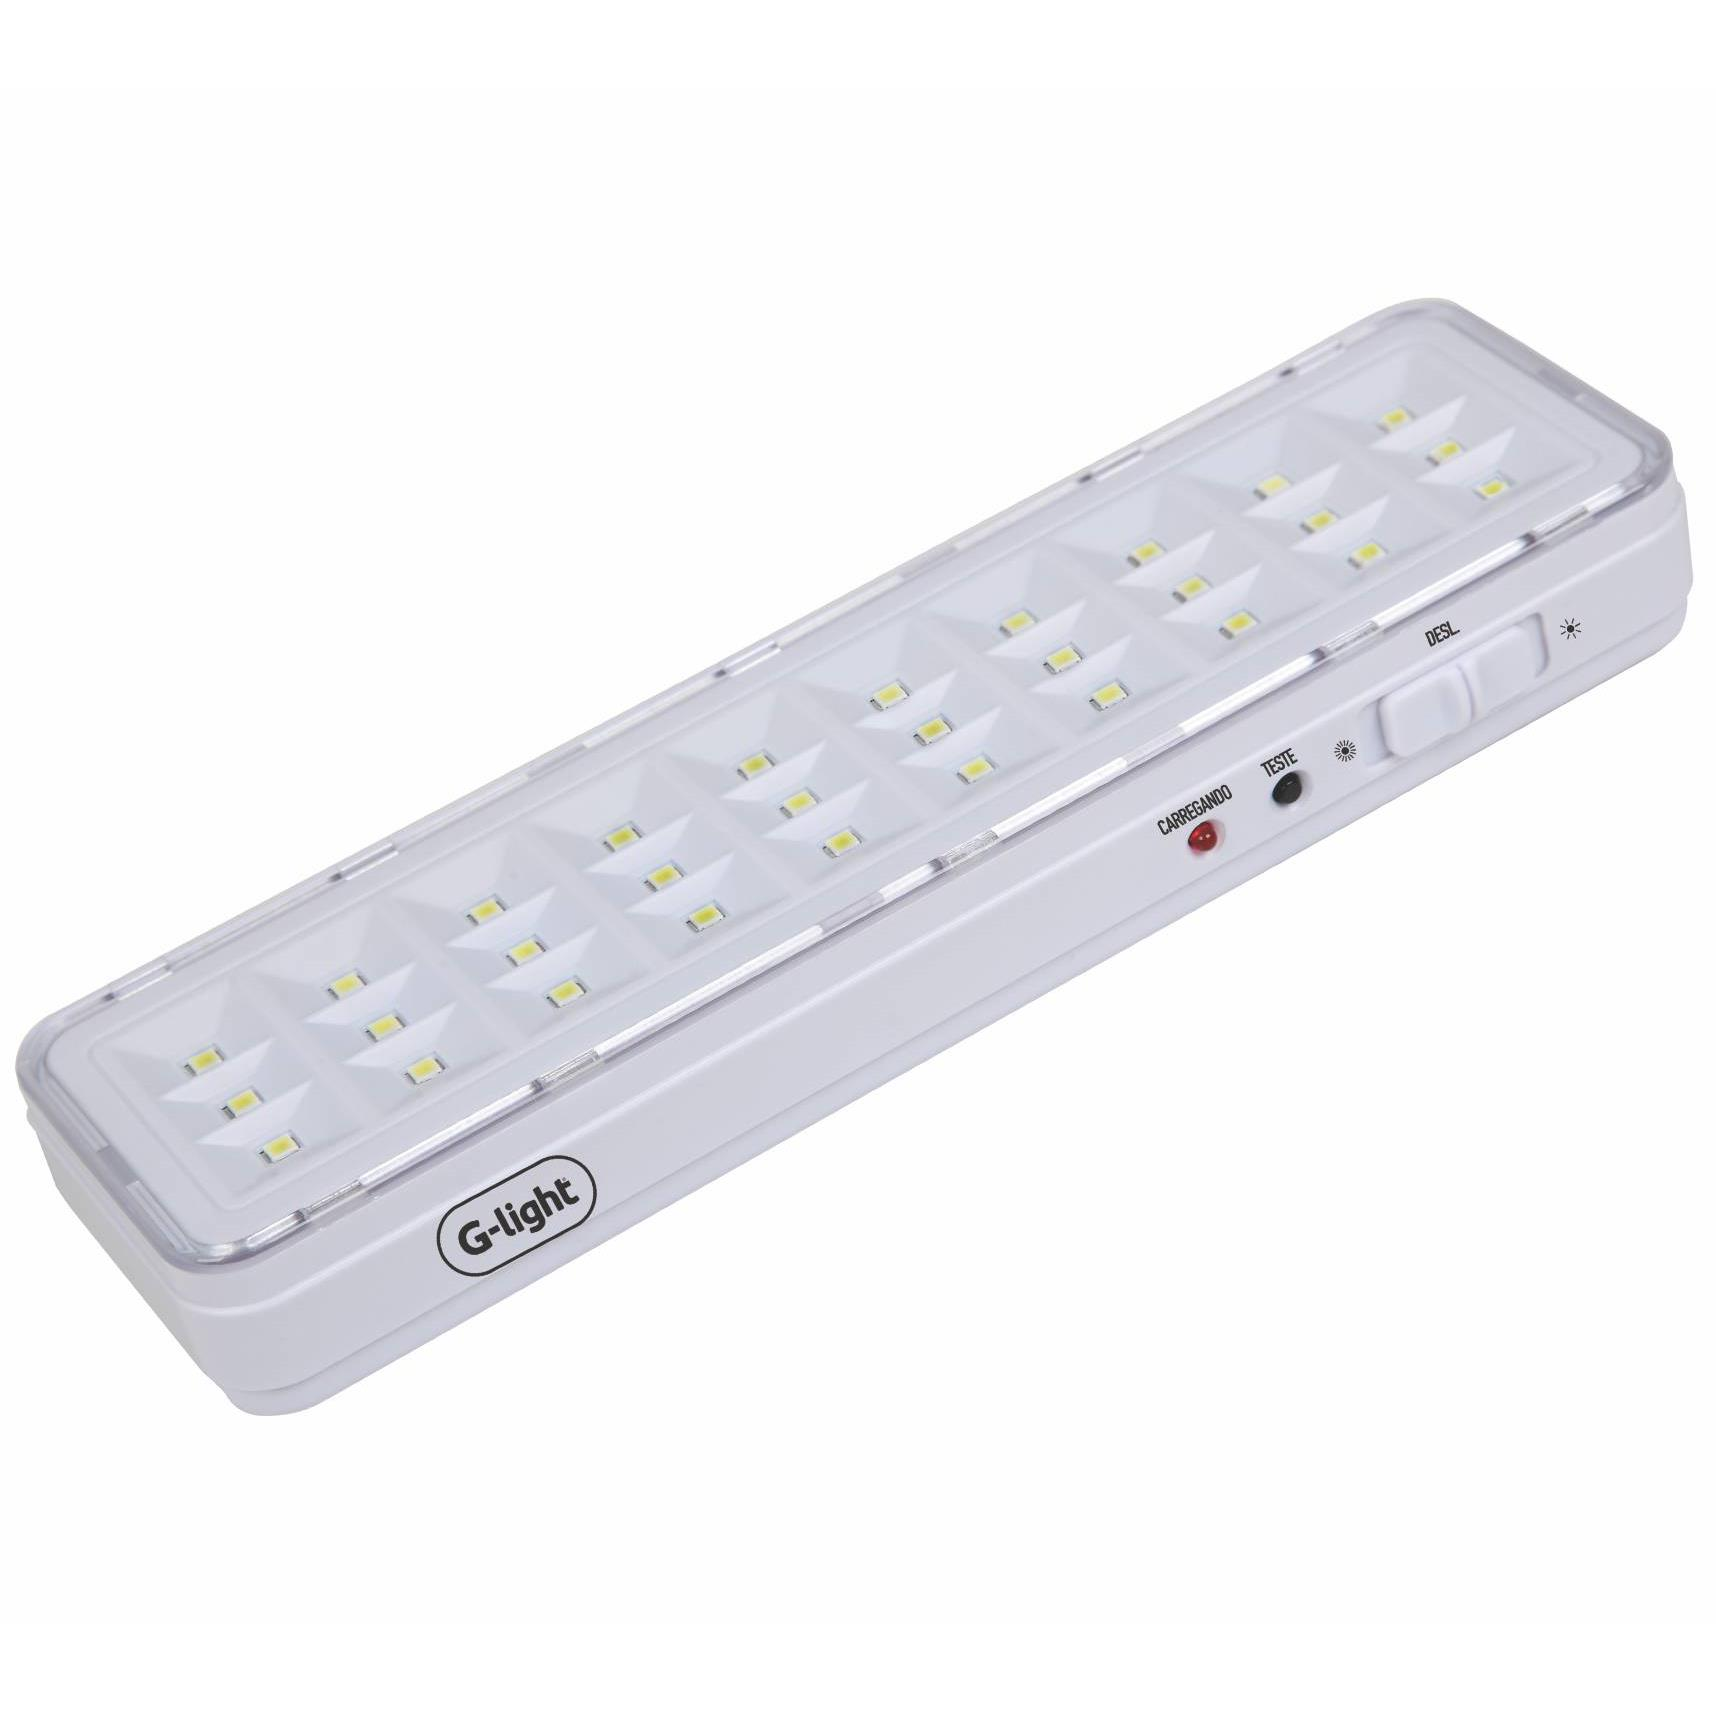 Luminaria De Emergencia Led Integrado 30 Lampadas 12W Autovolt - Branco - Glight